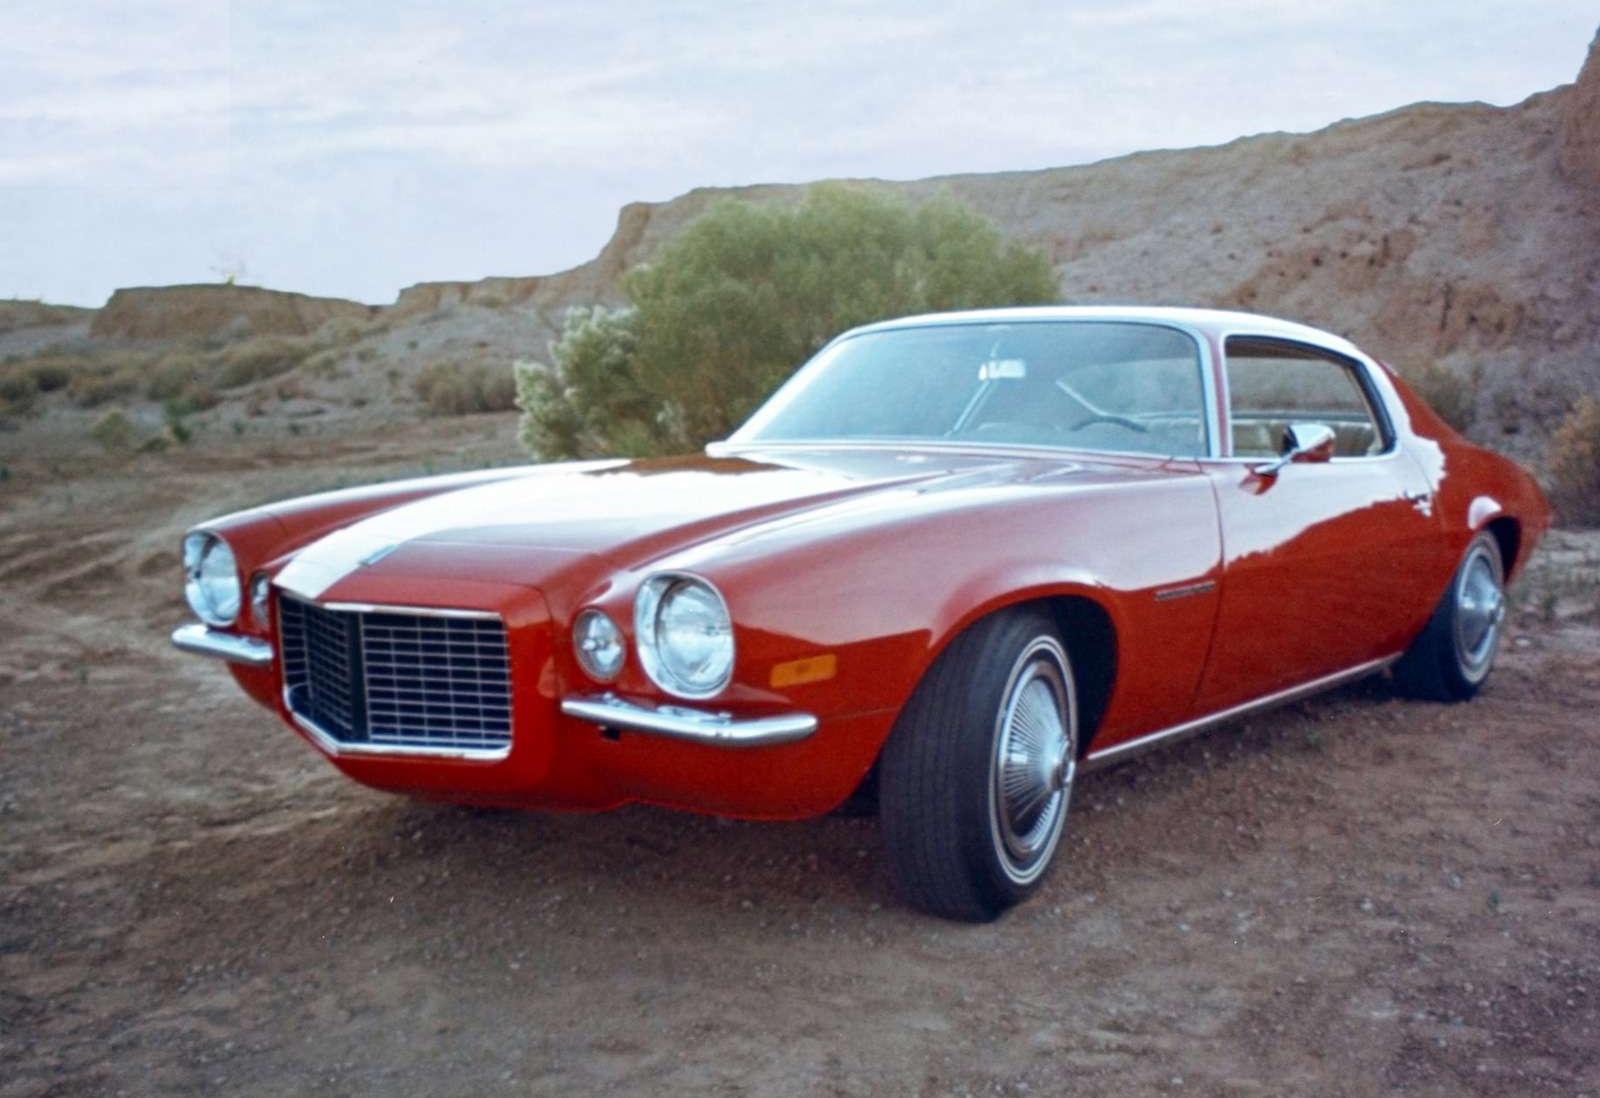 Chevrolet-Camaro-2nd-generation-1970